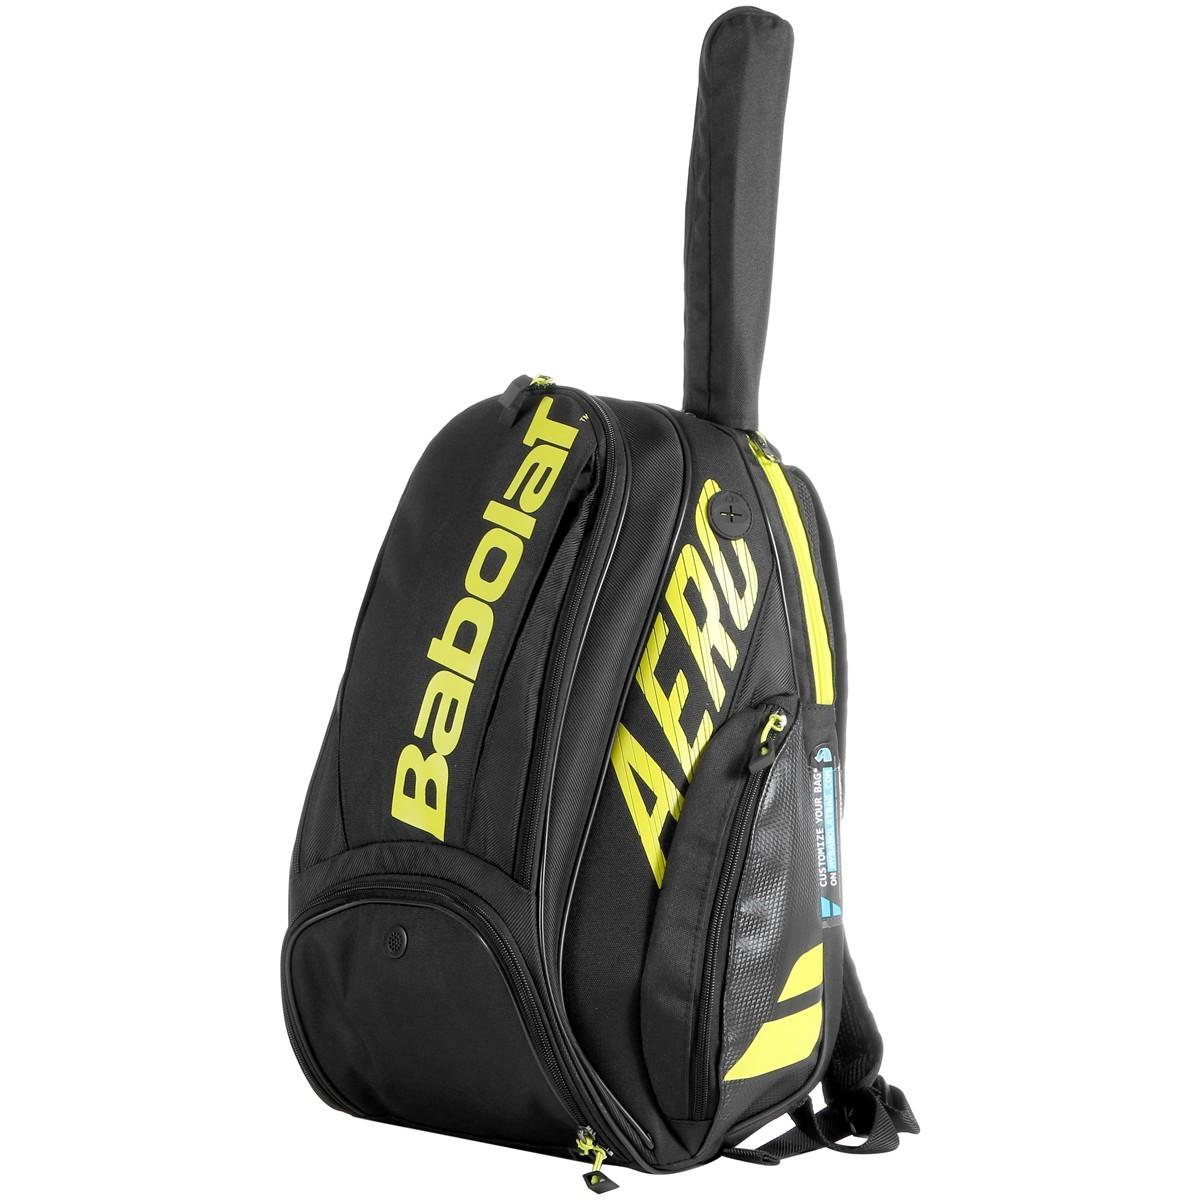 Теннисный рюкзак Babolat Pure Aero Backpack 2021 black/yellow